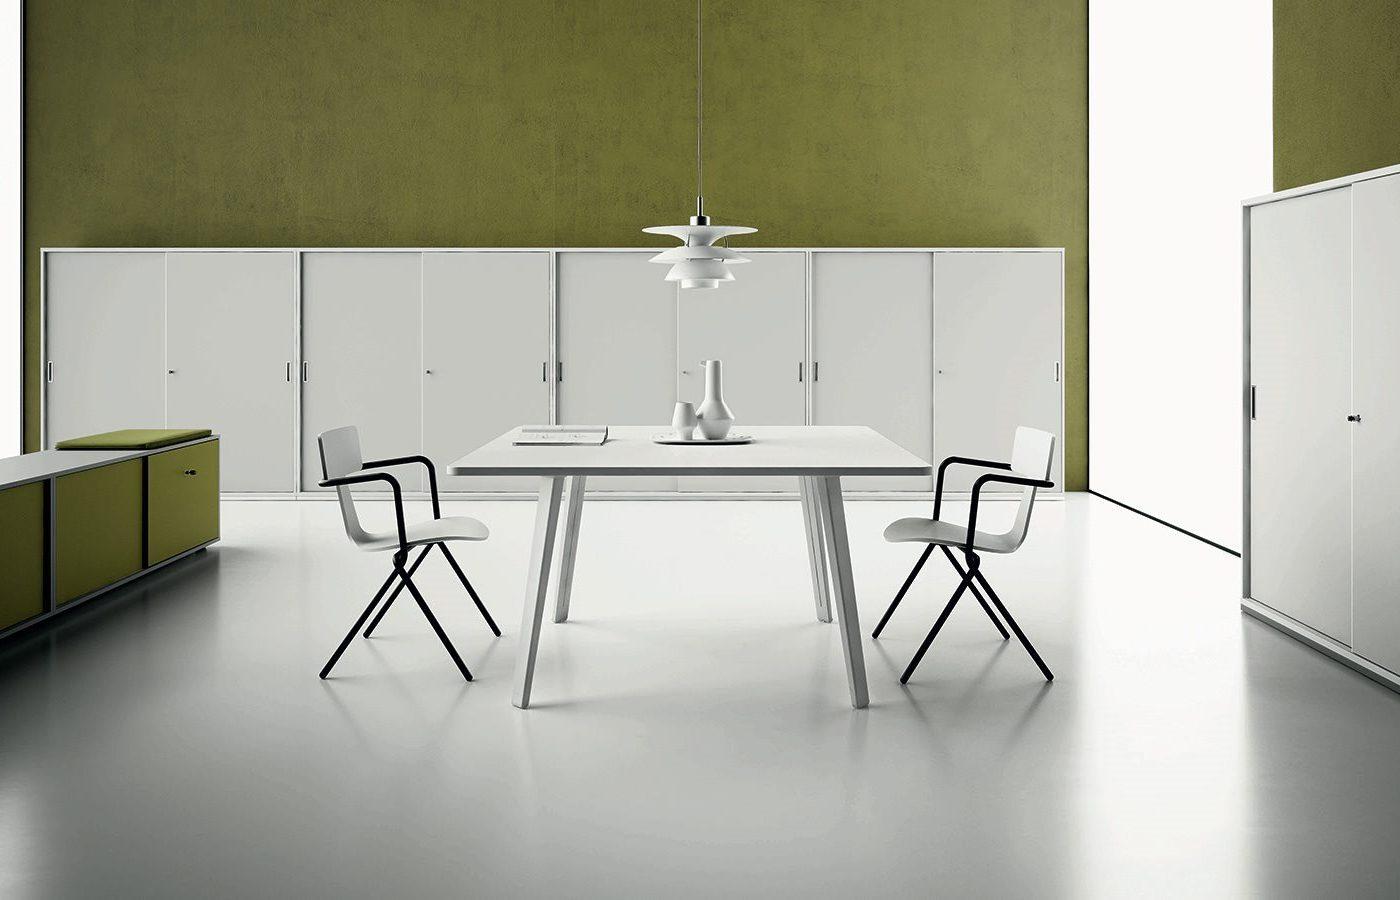 dvo_tavoli_DV990_workstation-table_gallery_14_zoom